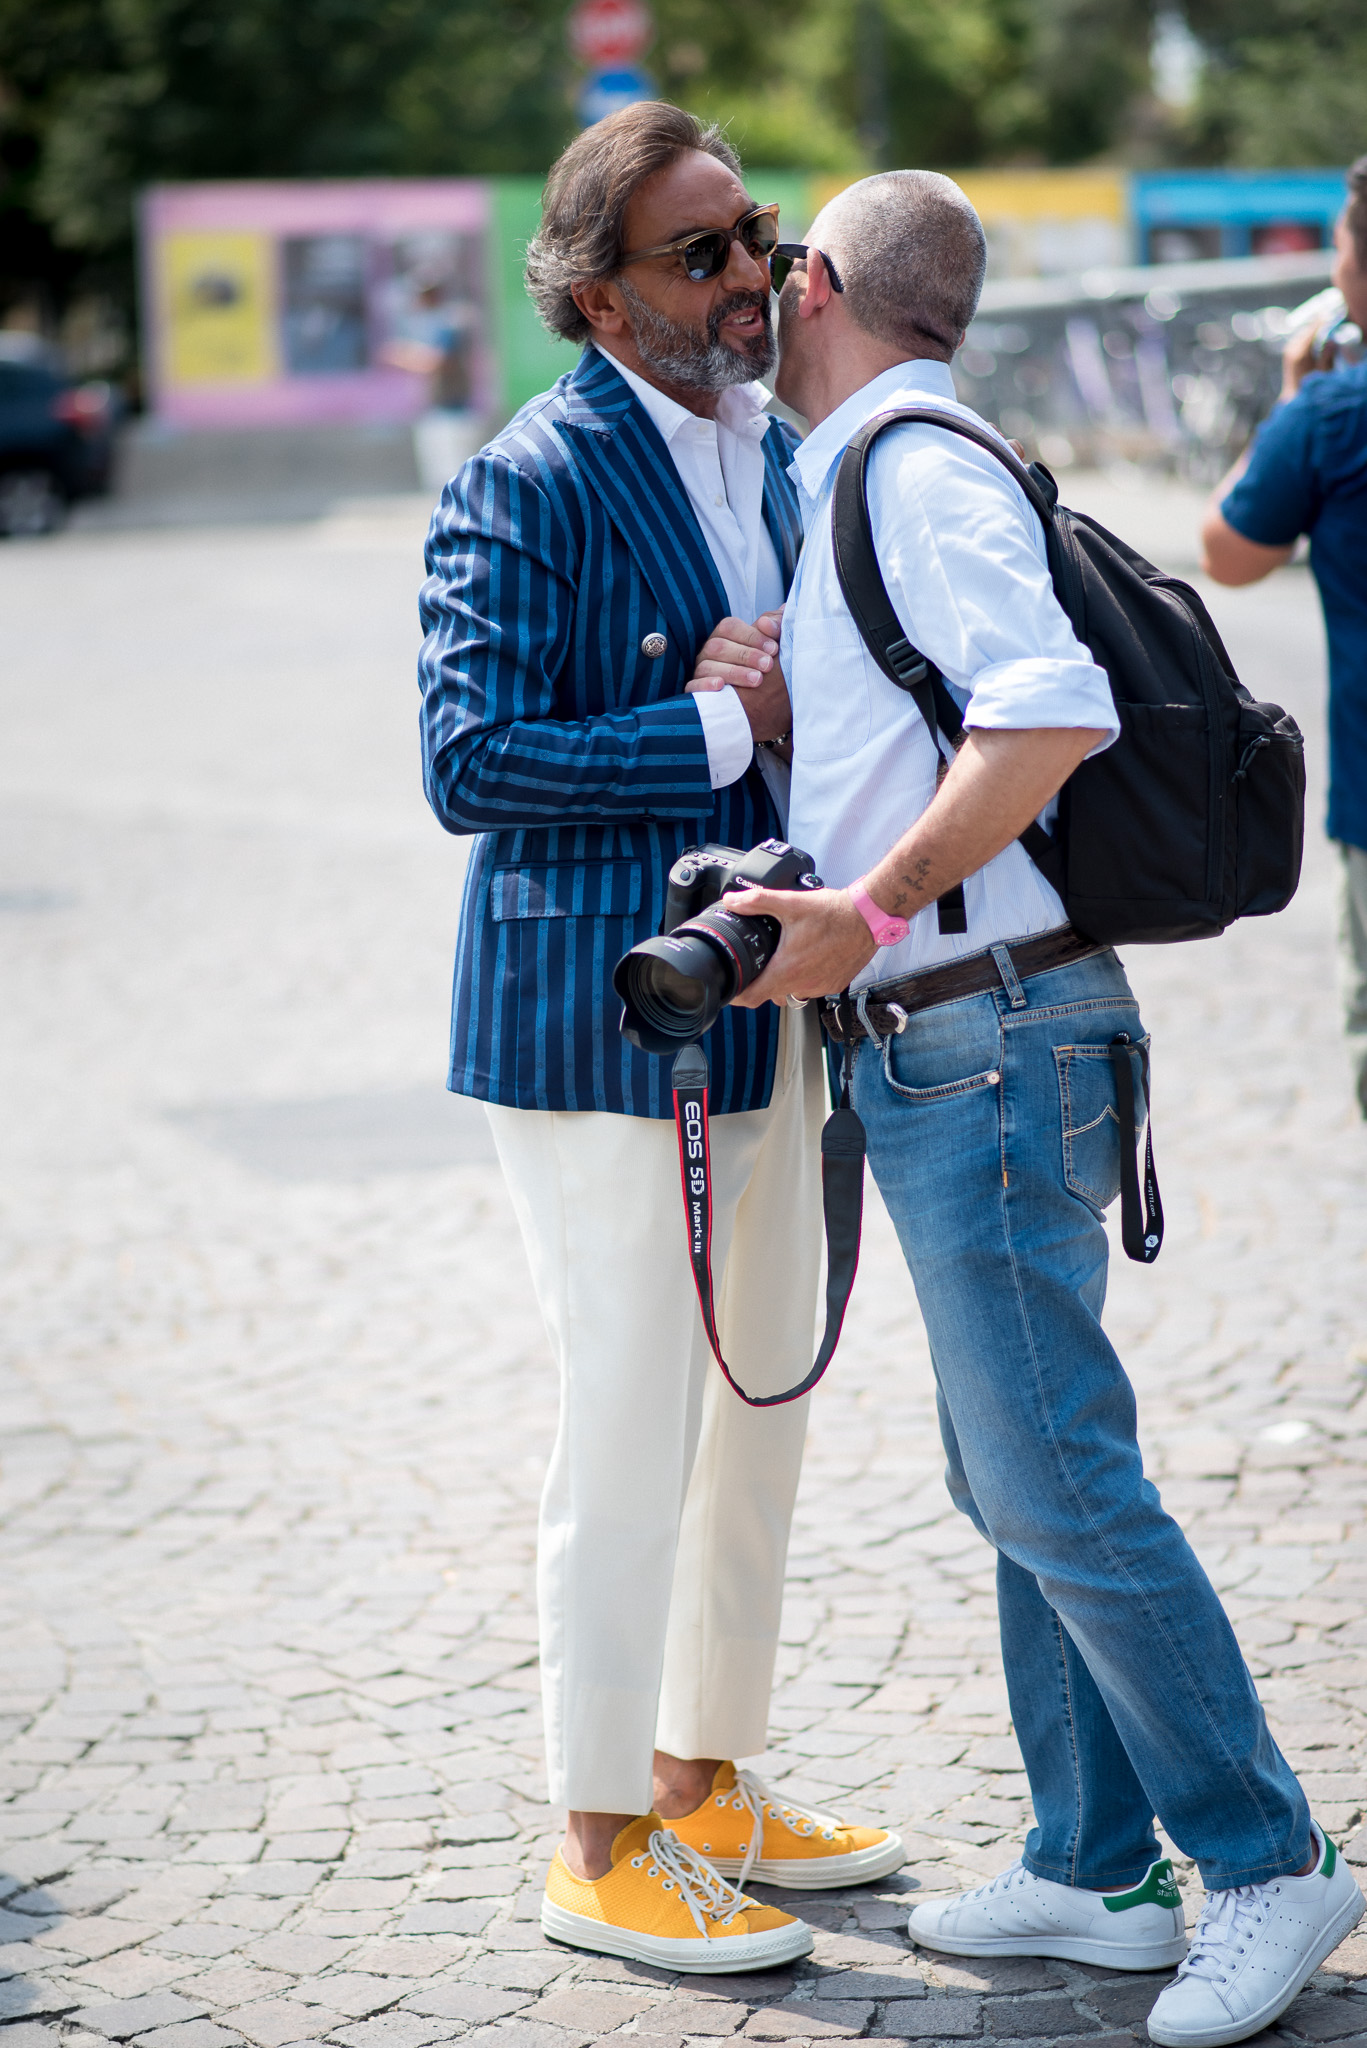 Felice Vitale & Mauro del Signore Pitti Uomo 92 Florence June 2017 Photography Annika Lagerqvist www.annikasomething.com